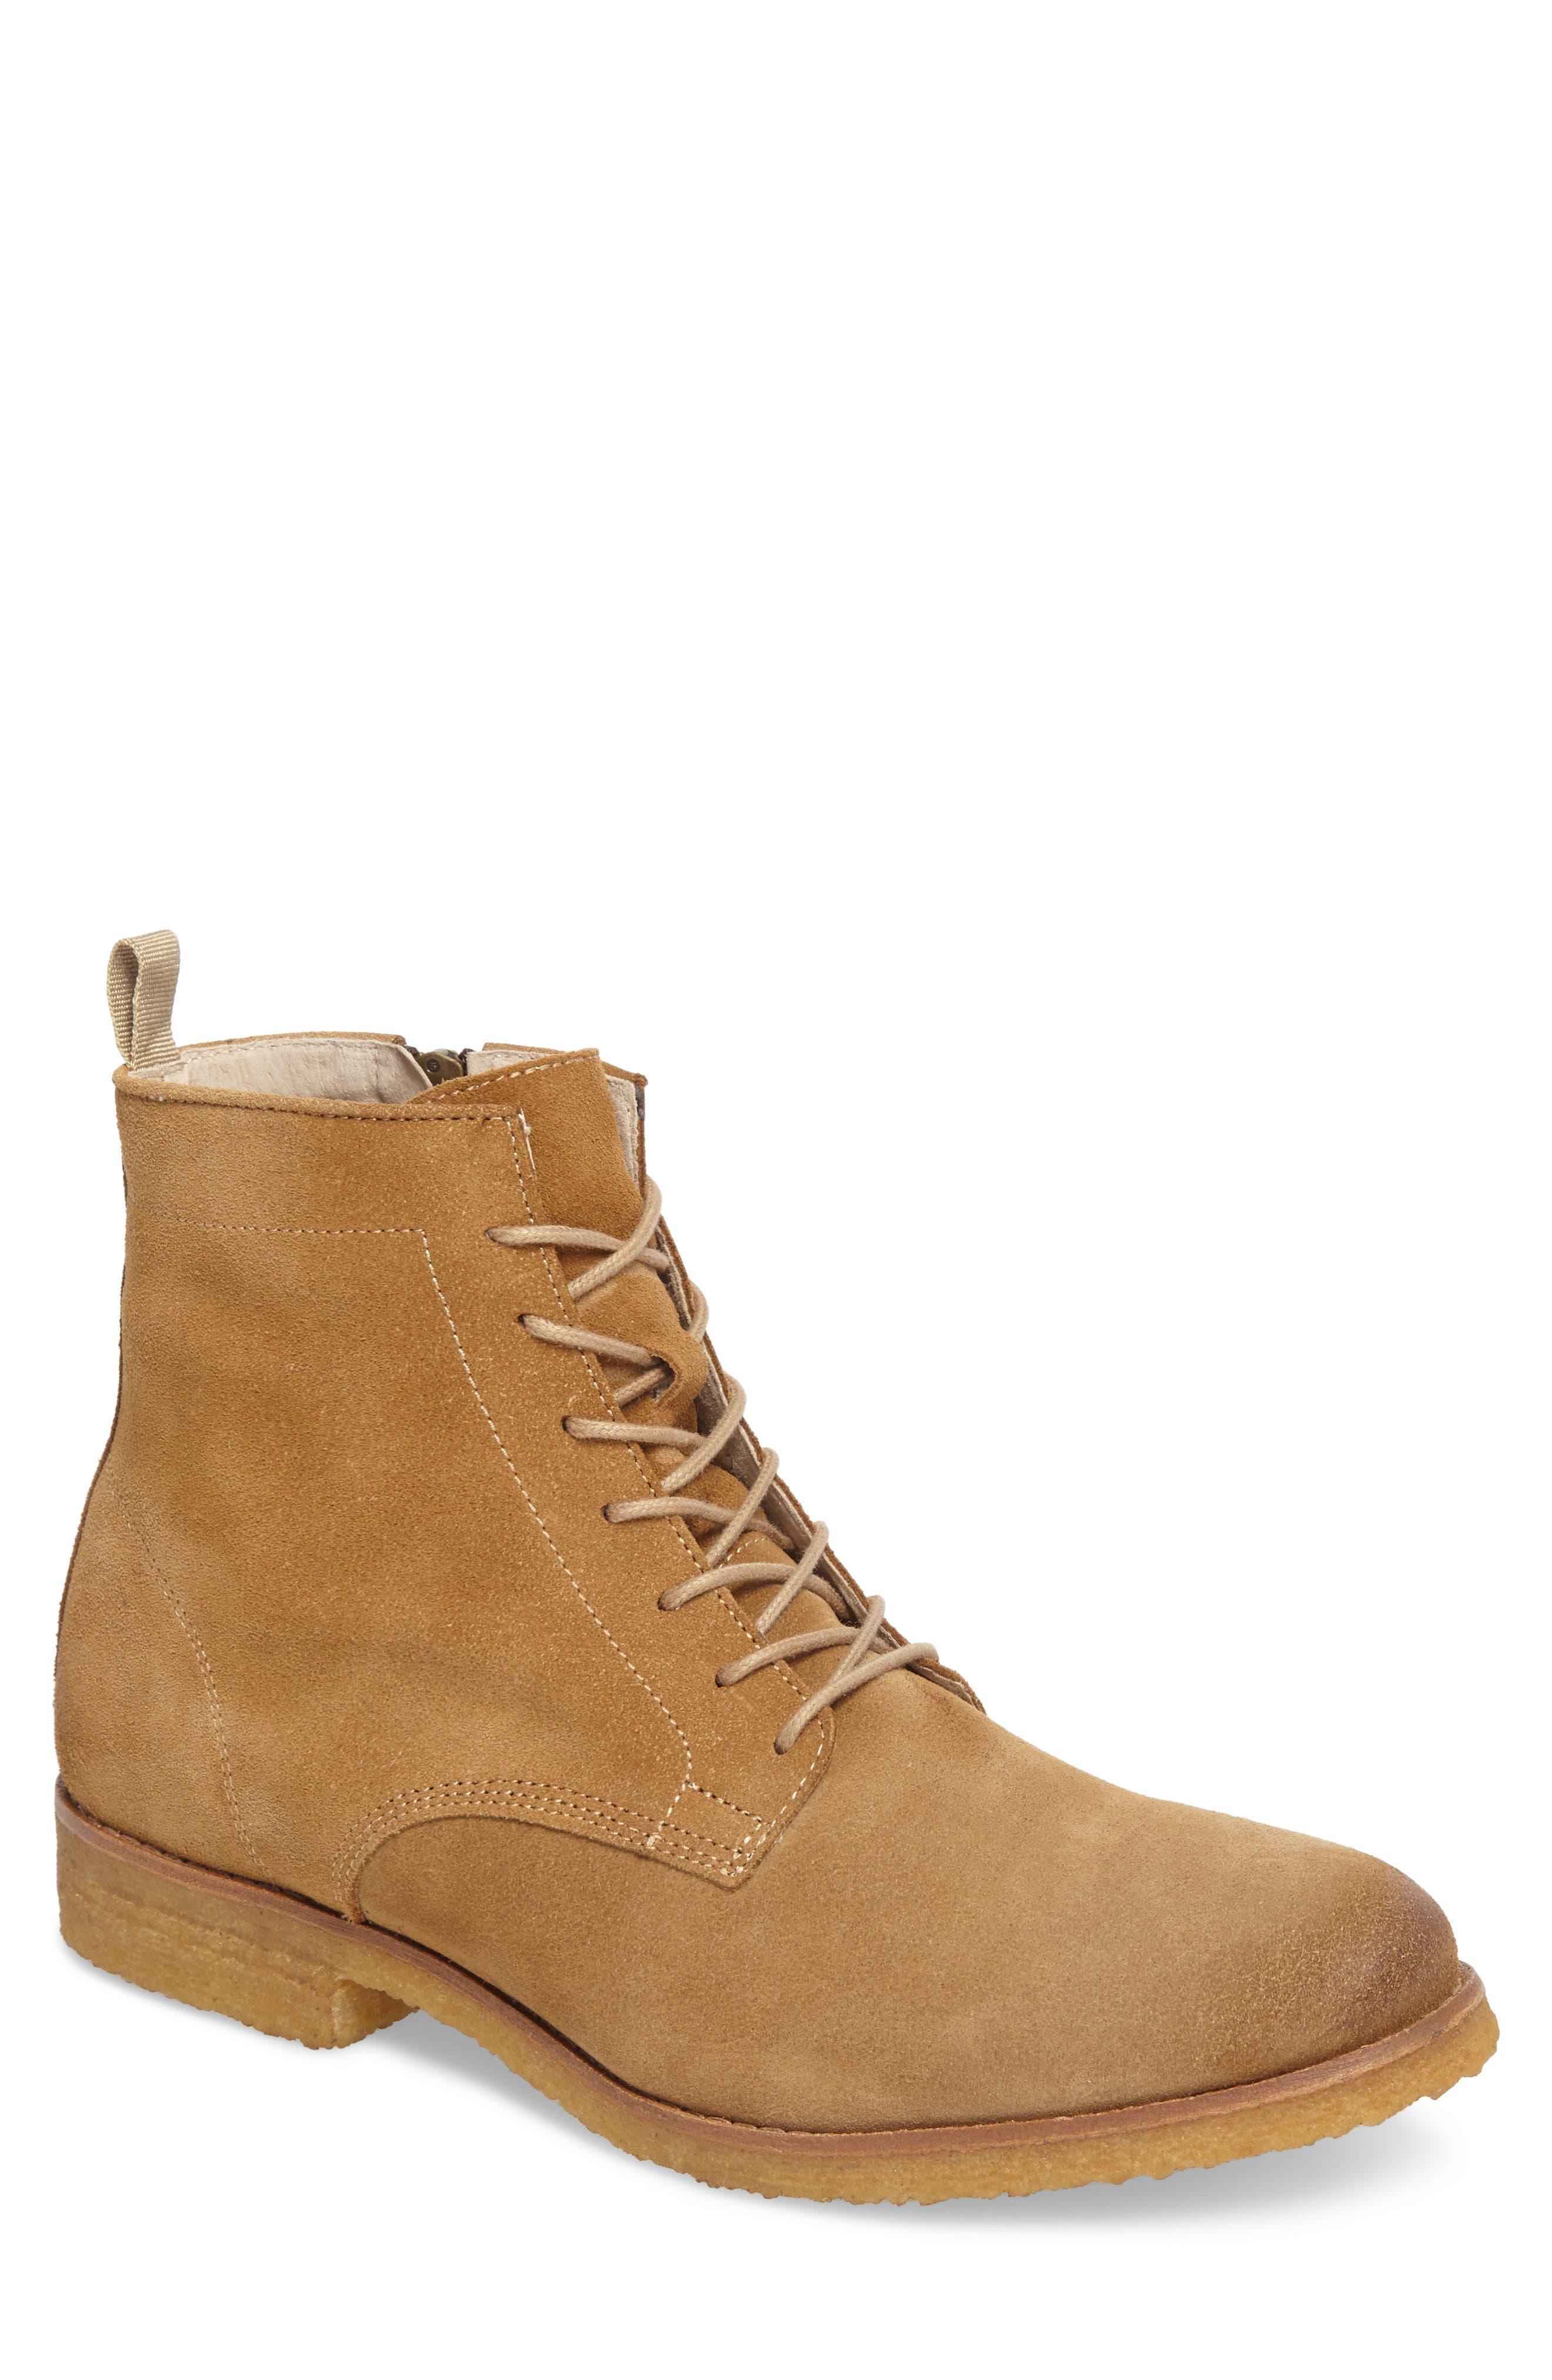 Jonah Plain Toe Boot,                         Main,                         color, Sand Suede